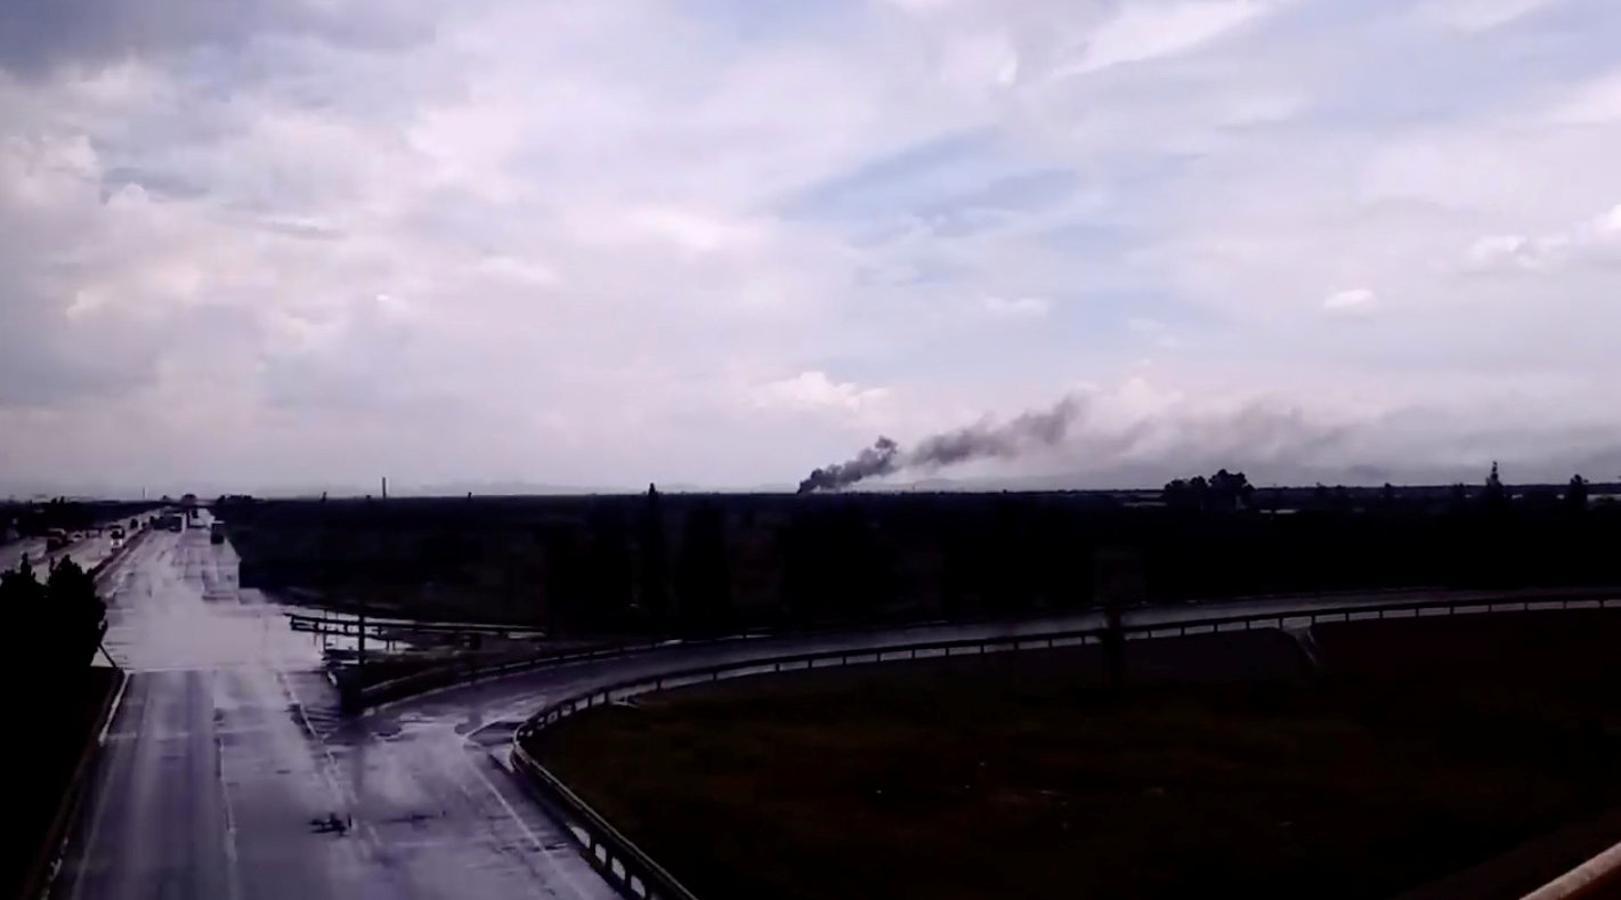 accidente-avion-aeromexico-durango-mexico (3)-kplC--1621x900@abc